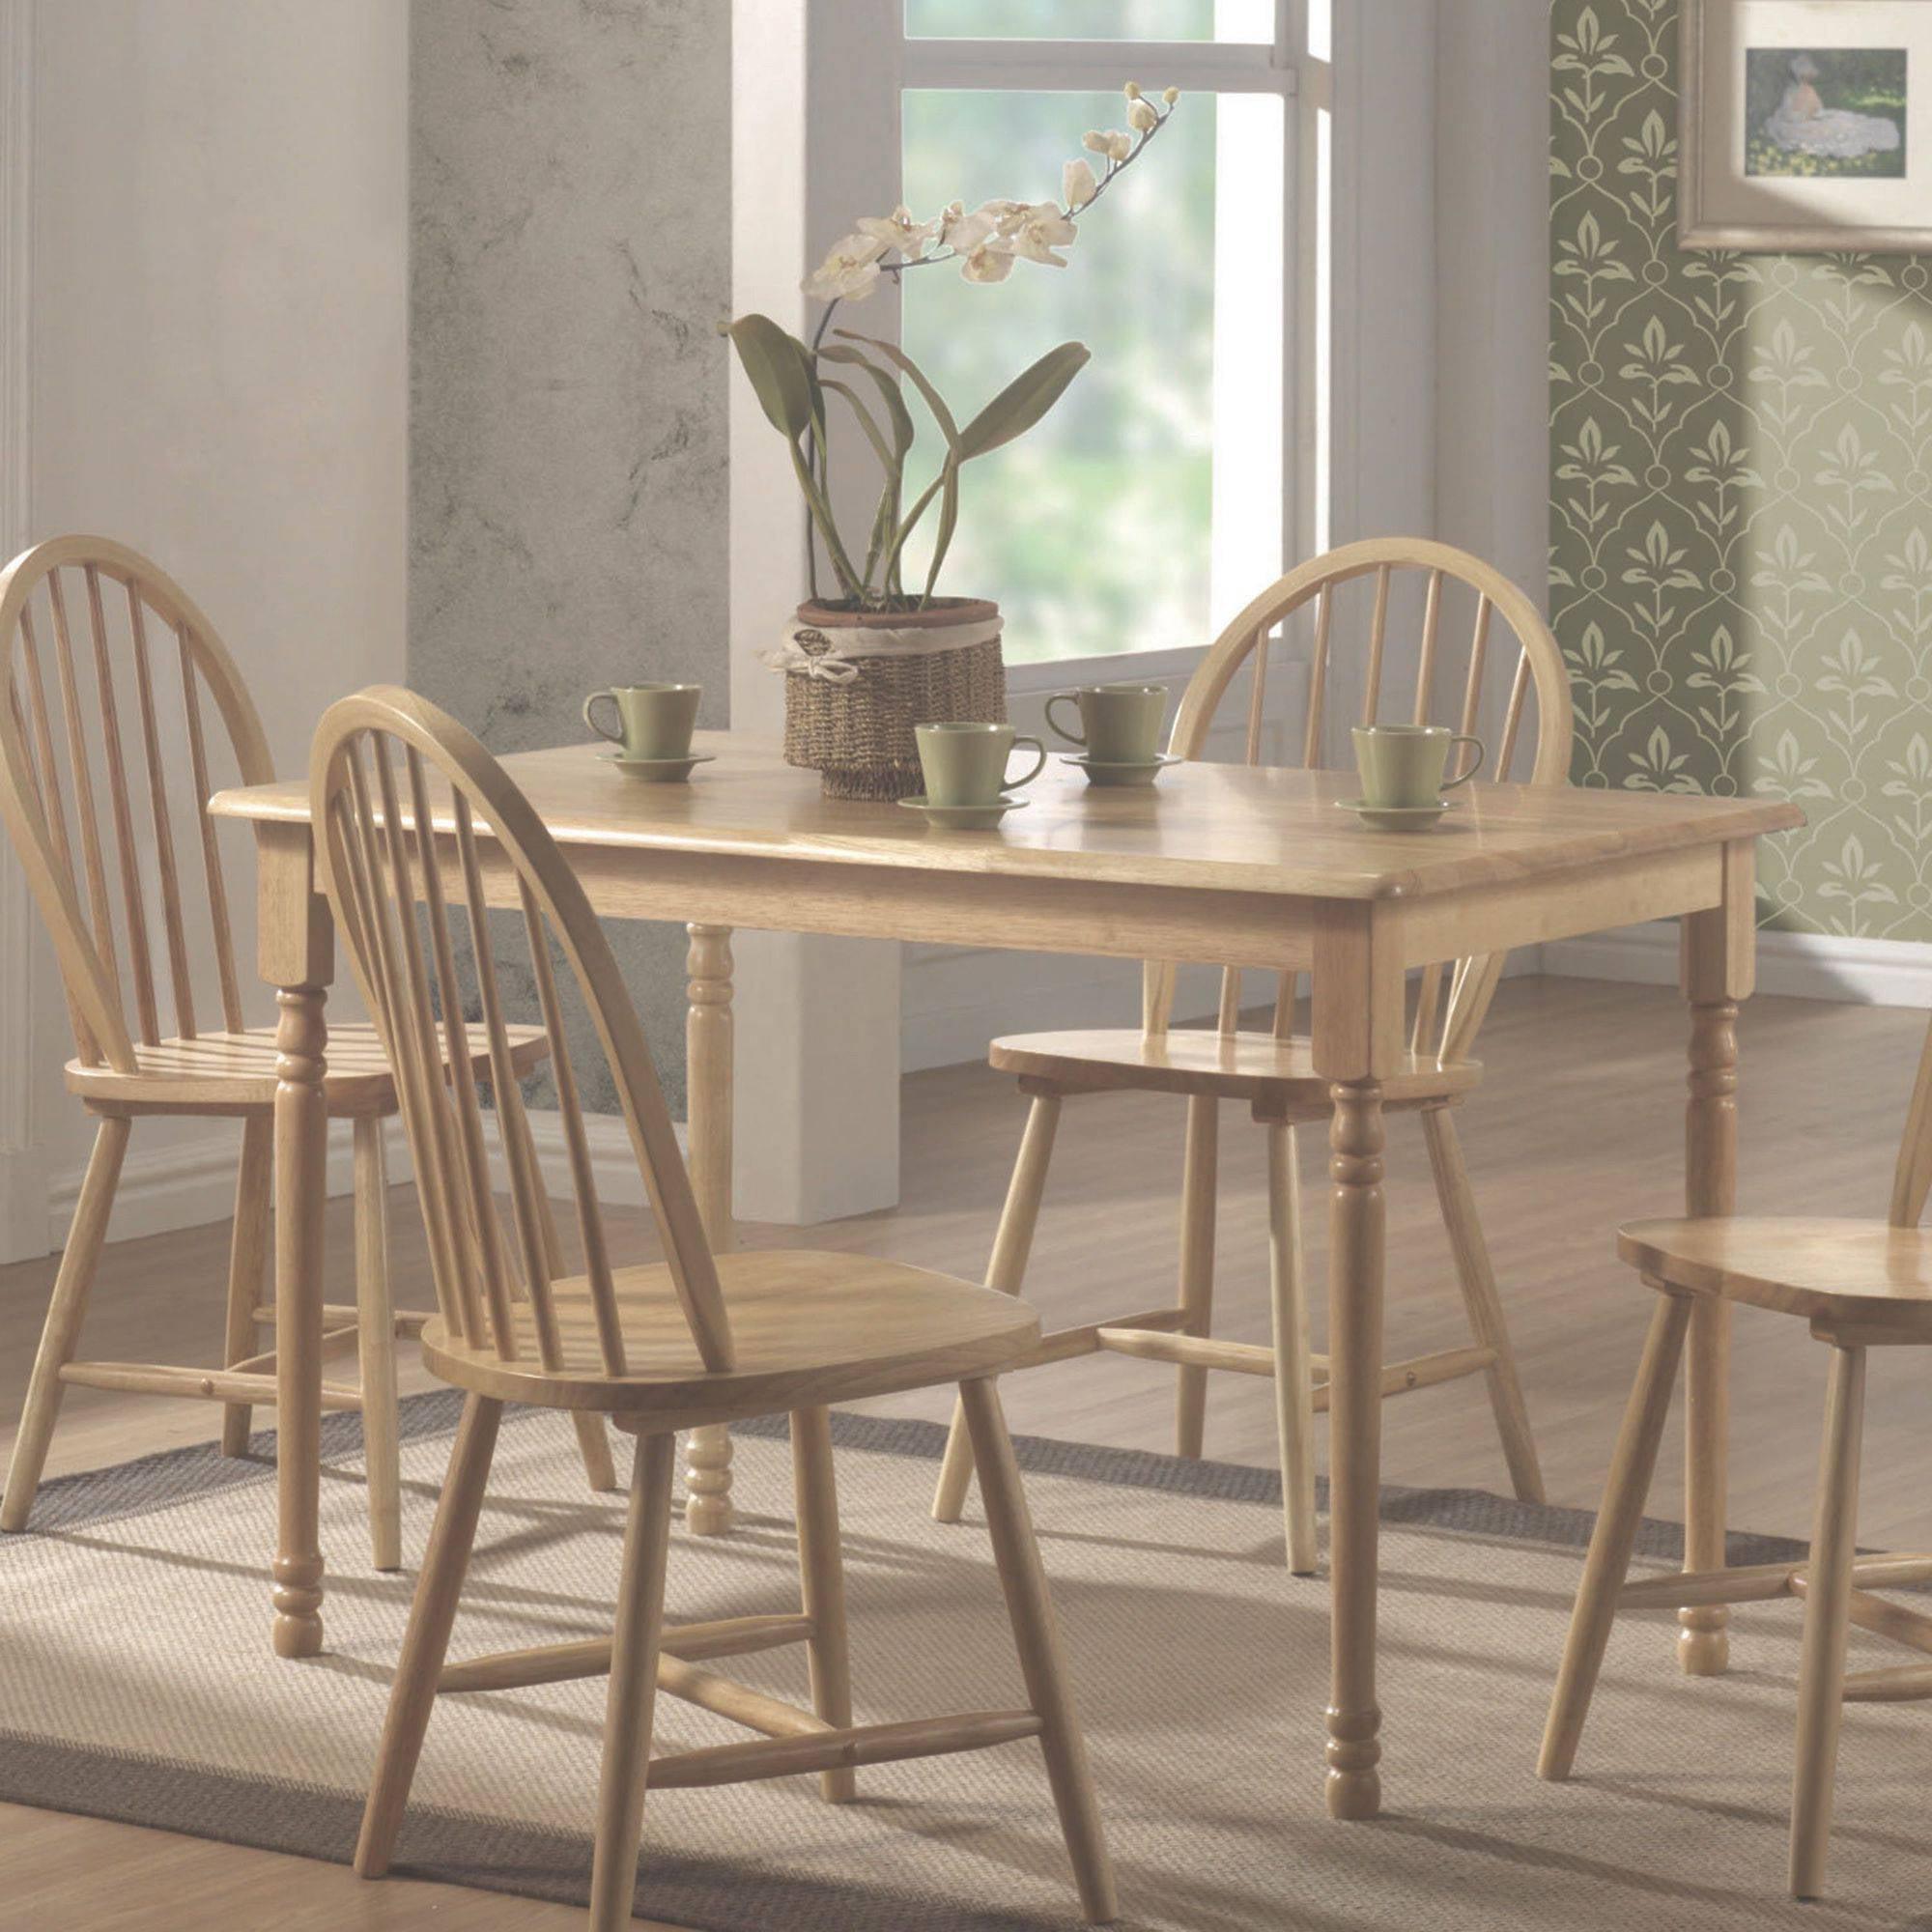 Coaster Damen Rectangle Leg Dining Table in Warm Natural Wood